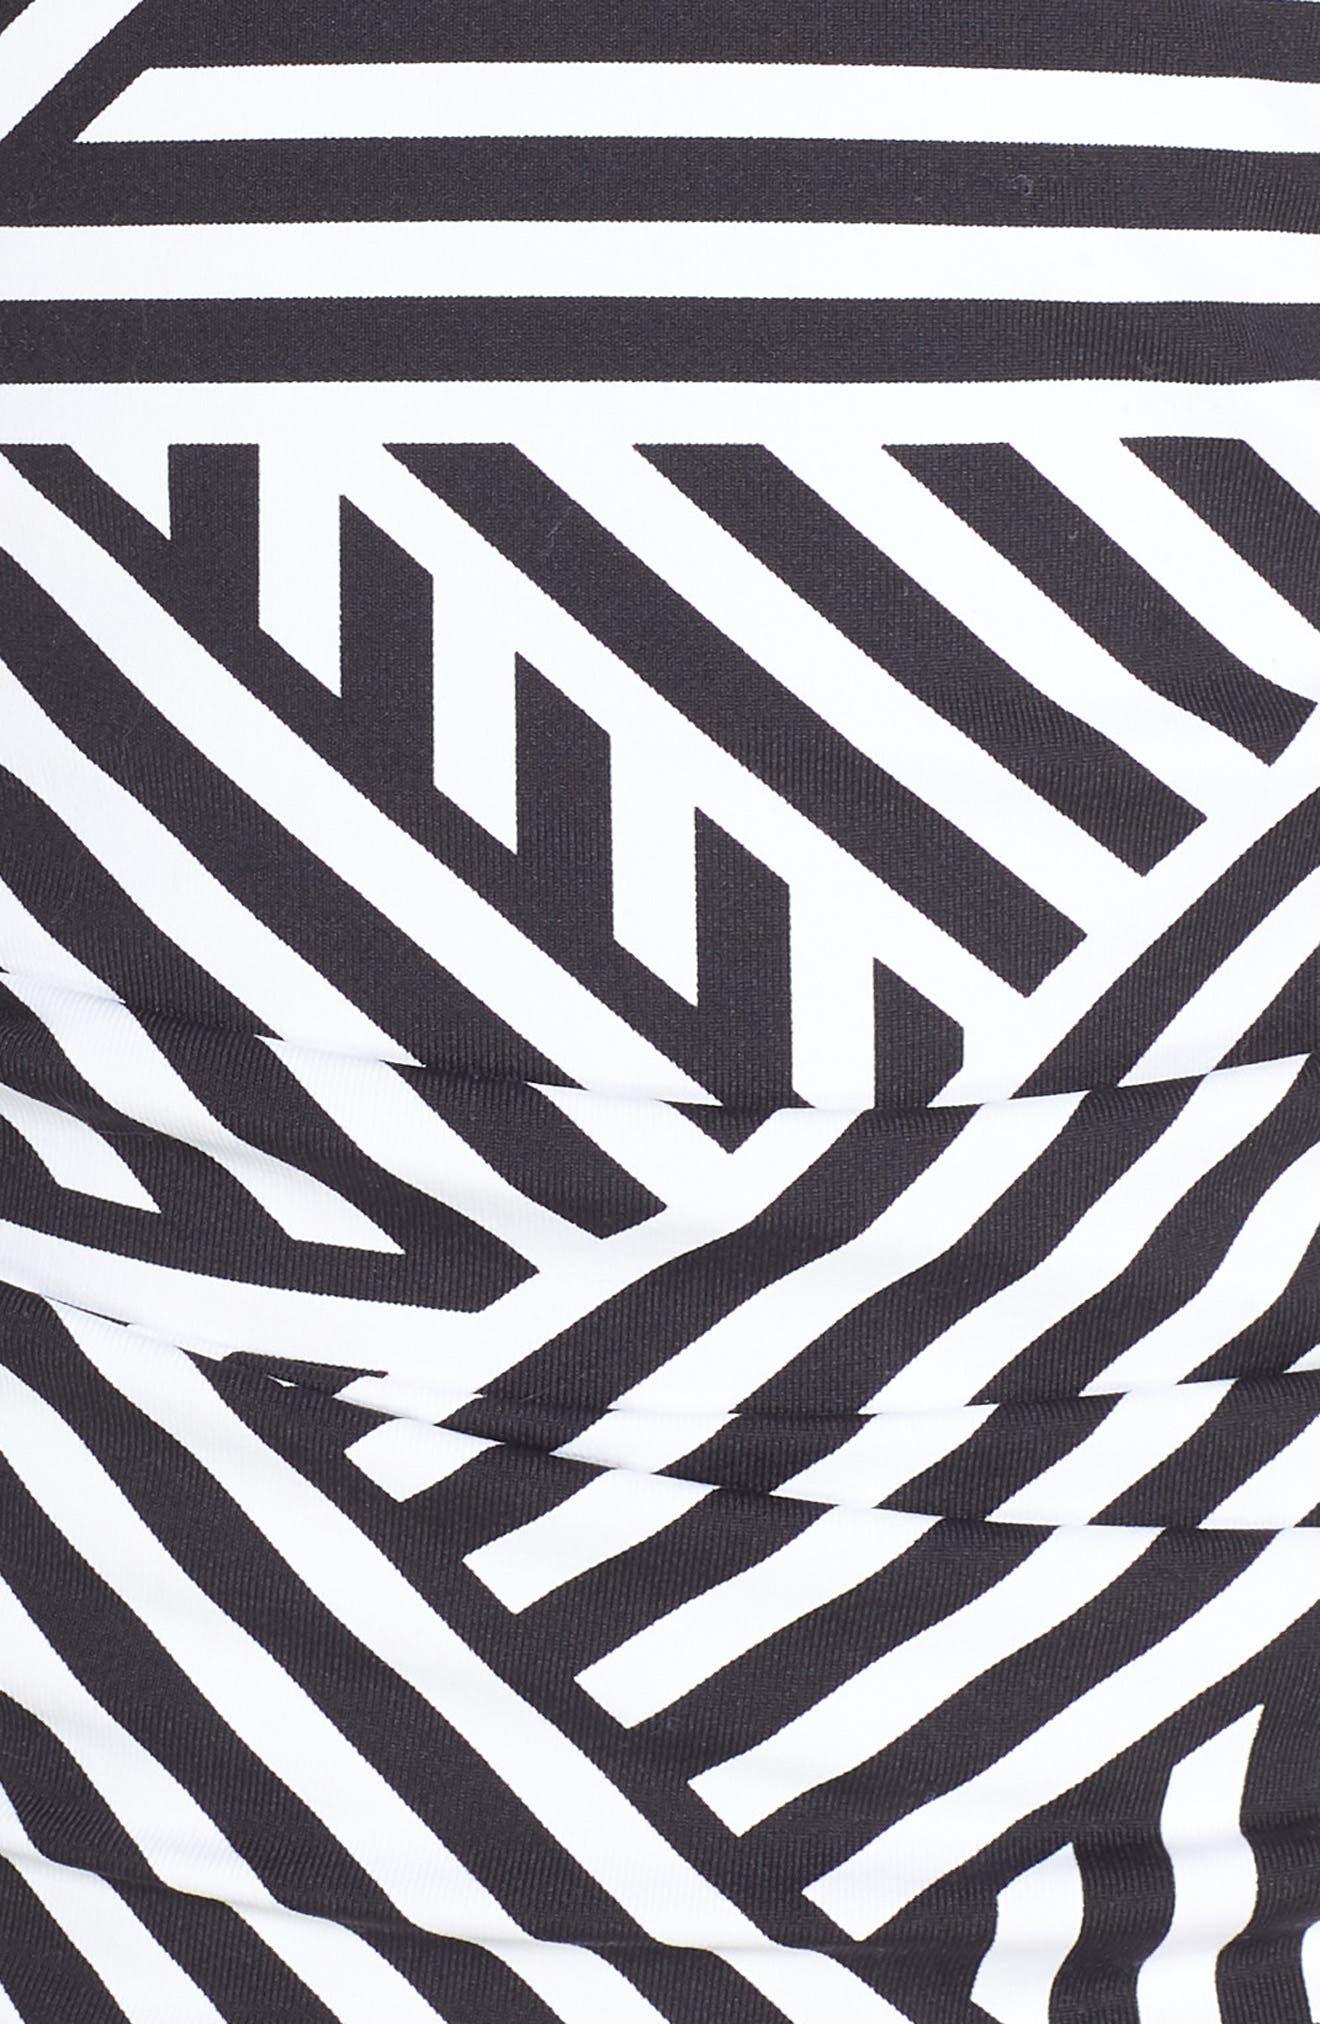 TOMMY BAHAMA,                             Fractured Stripe Tankini Top,                             Alternate thumbnail 5, color,                             BLACK/ WHITE